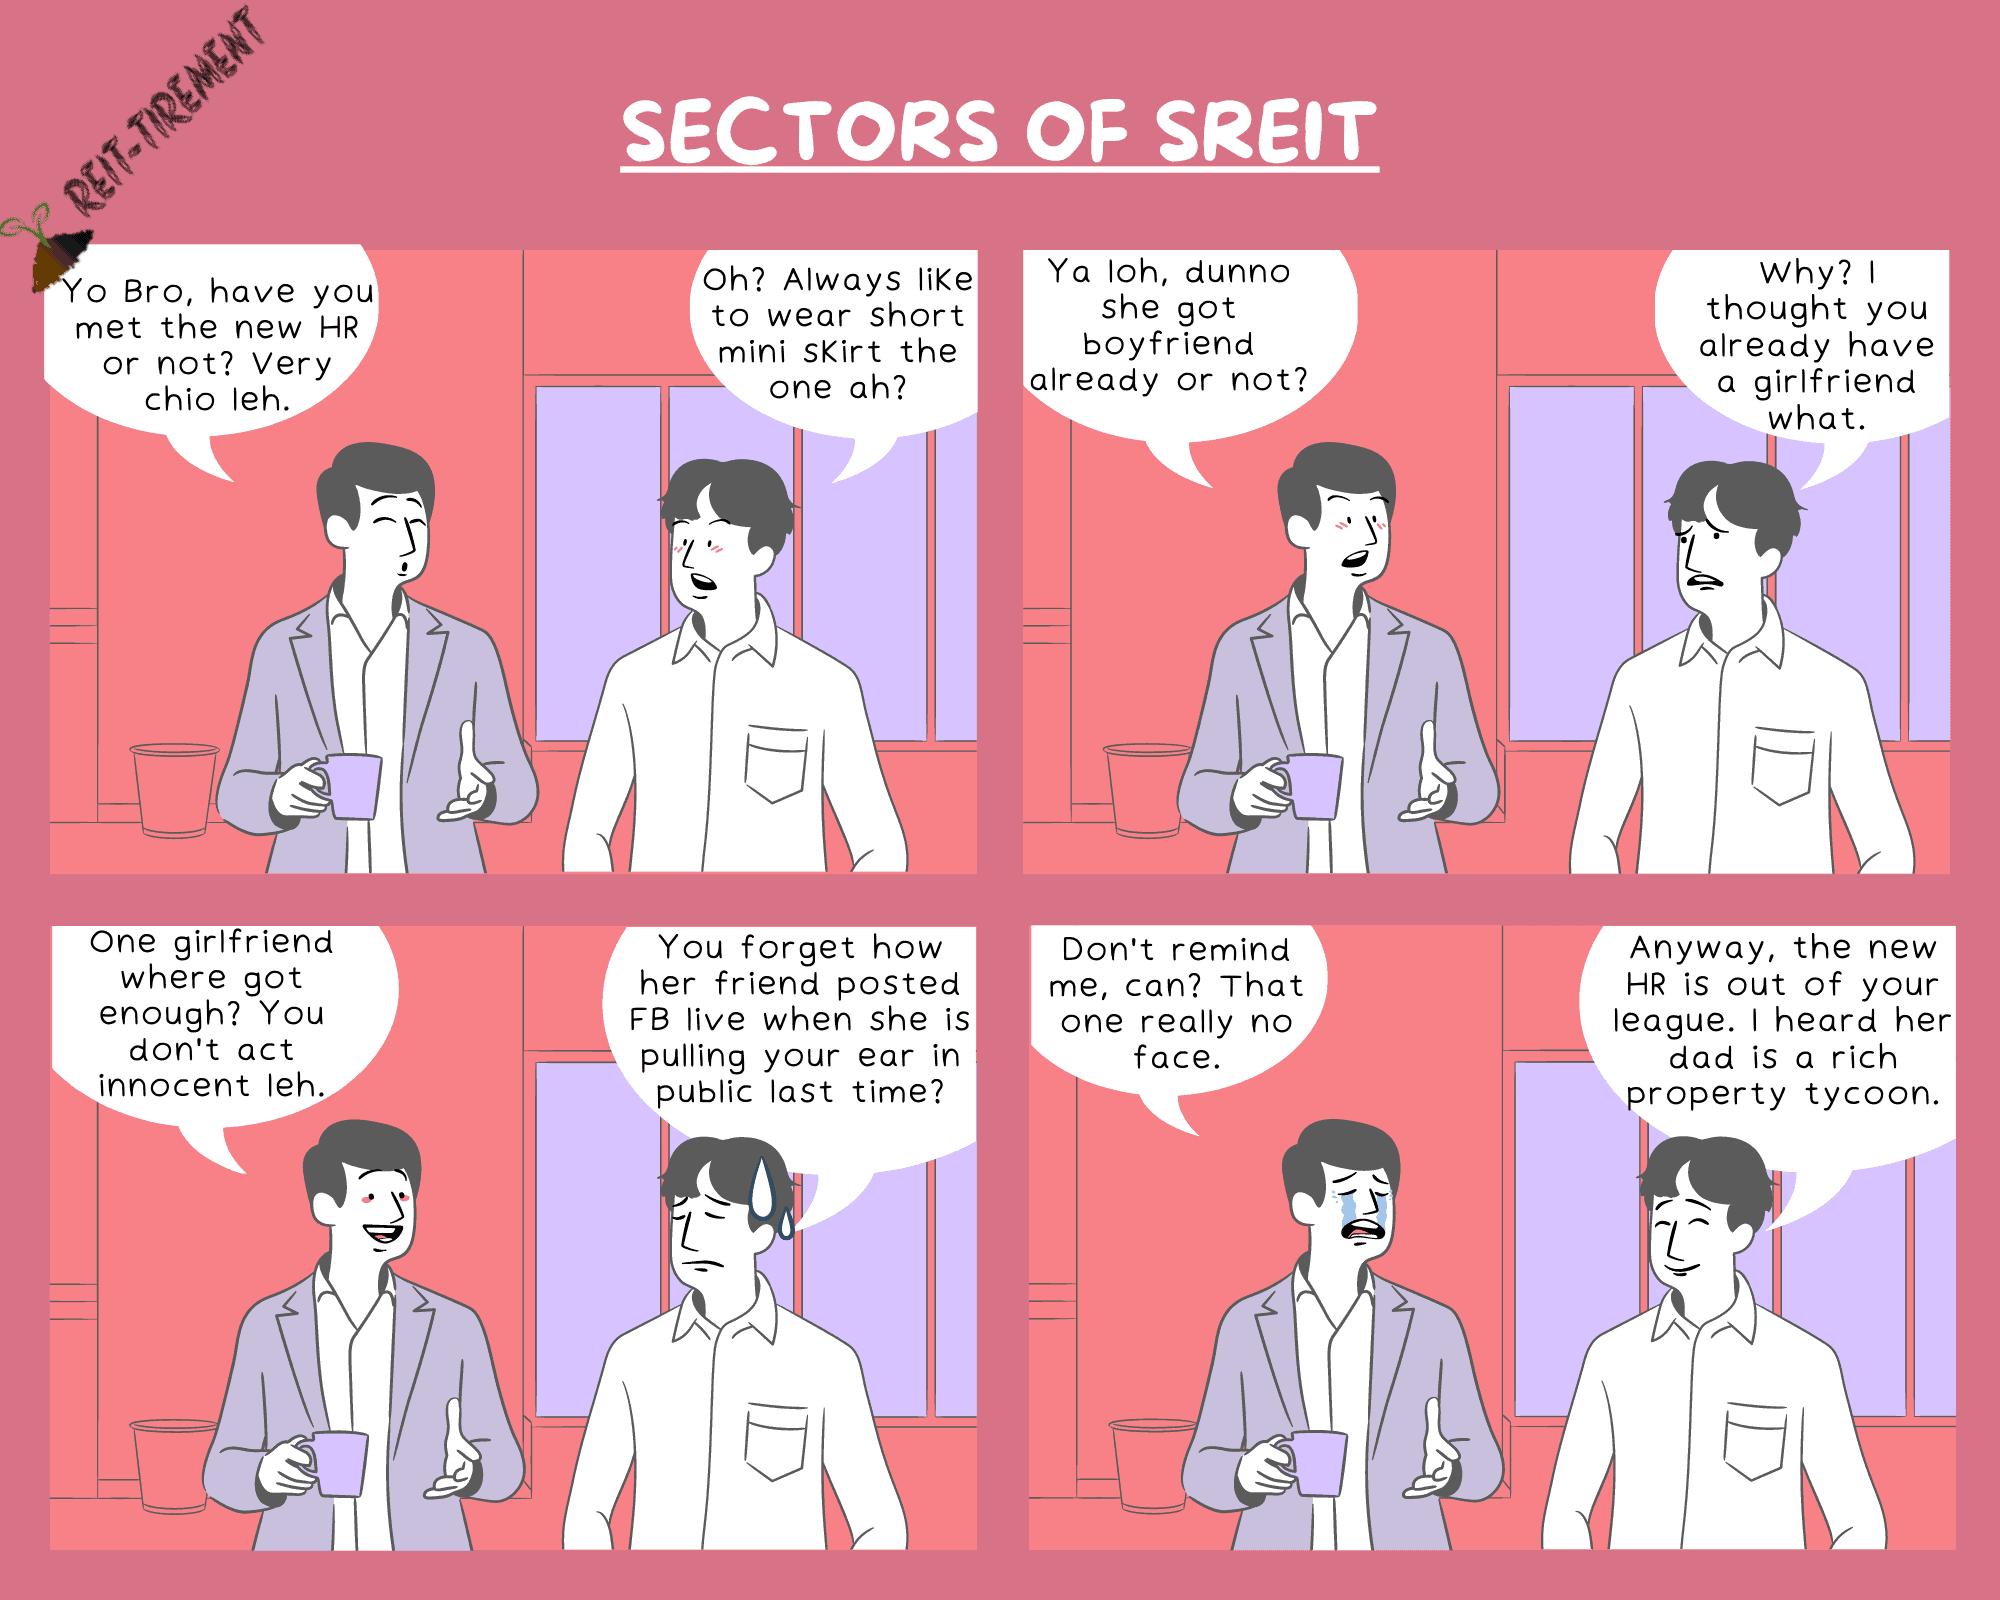 Comic Strip – Sectors of SREIT